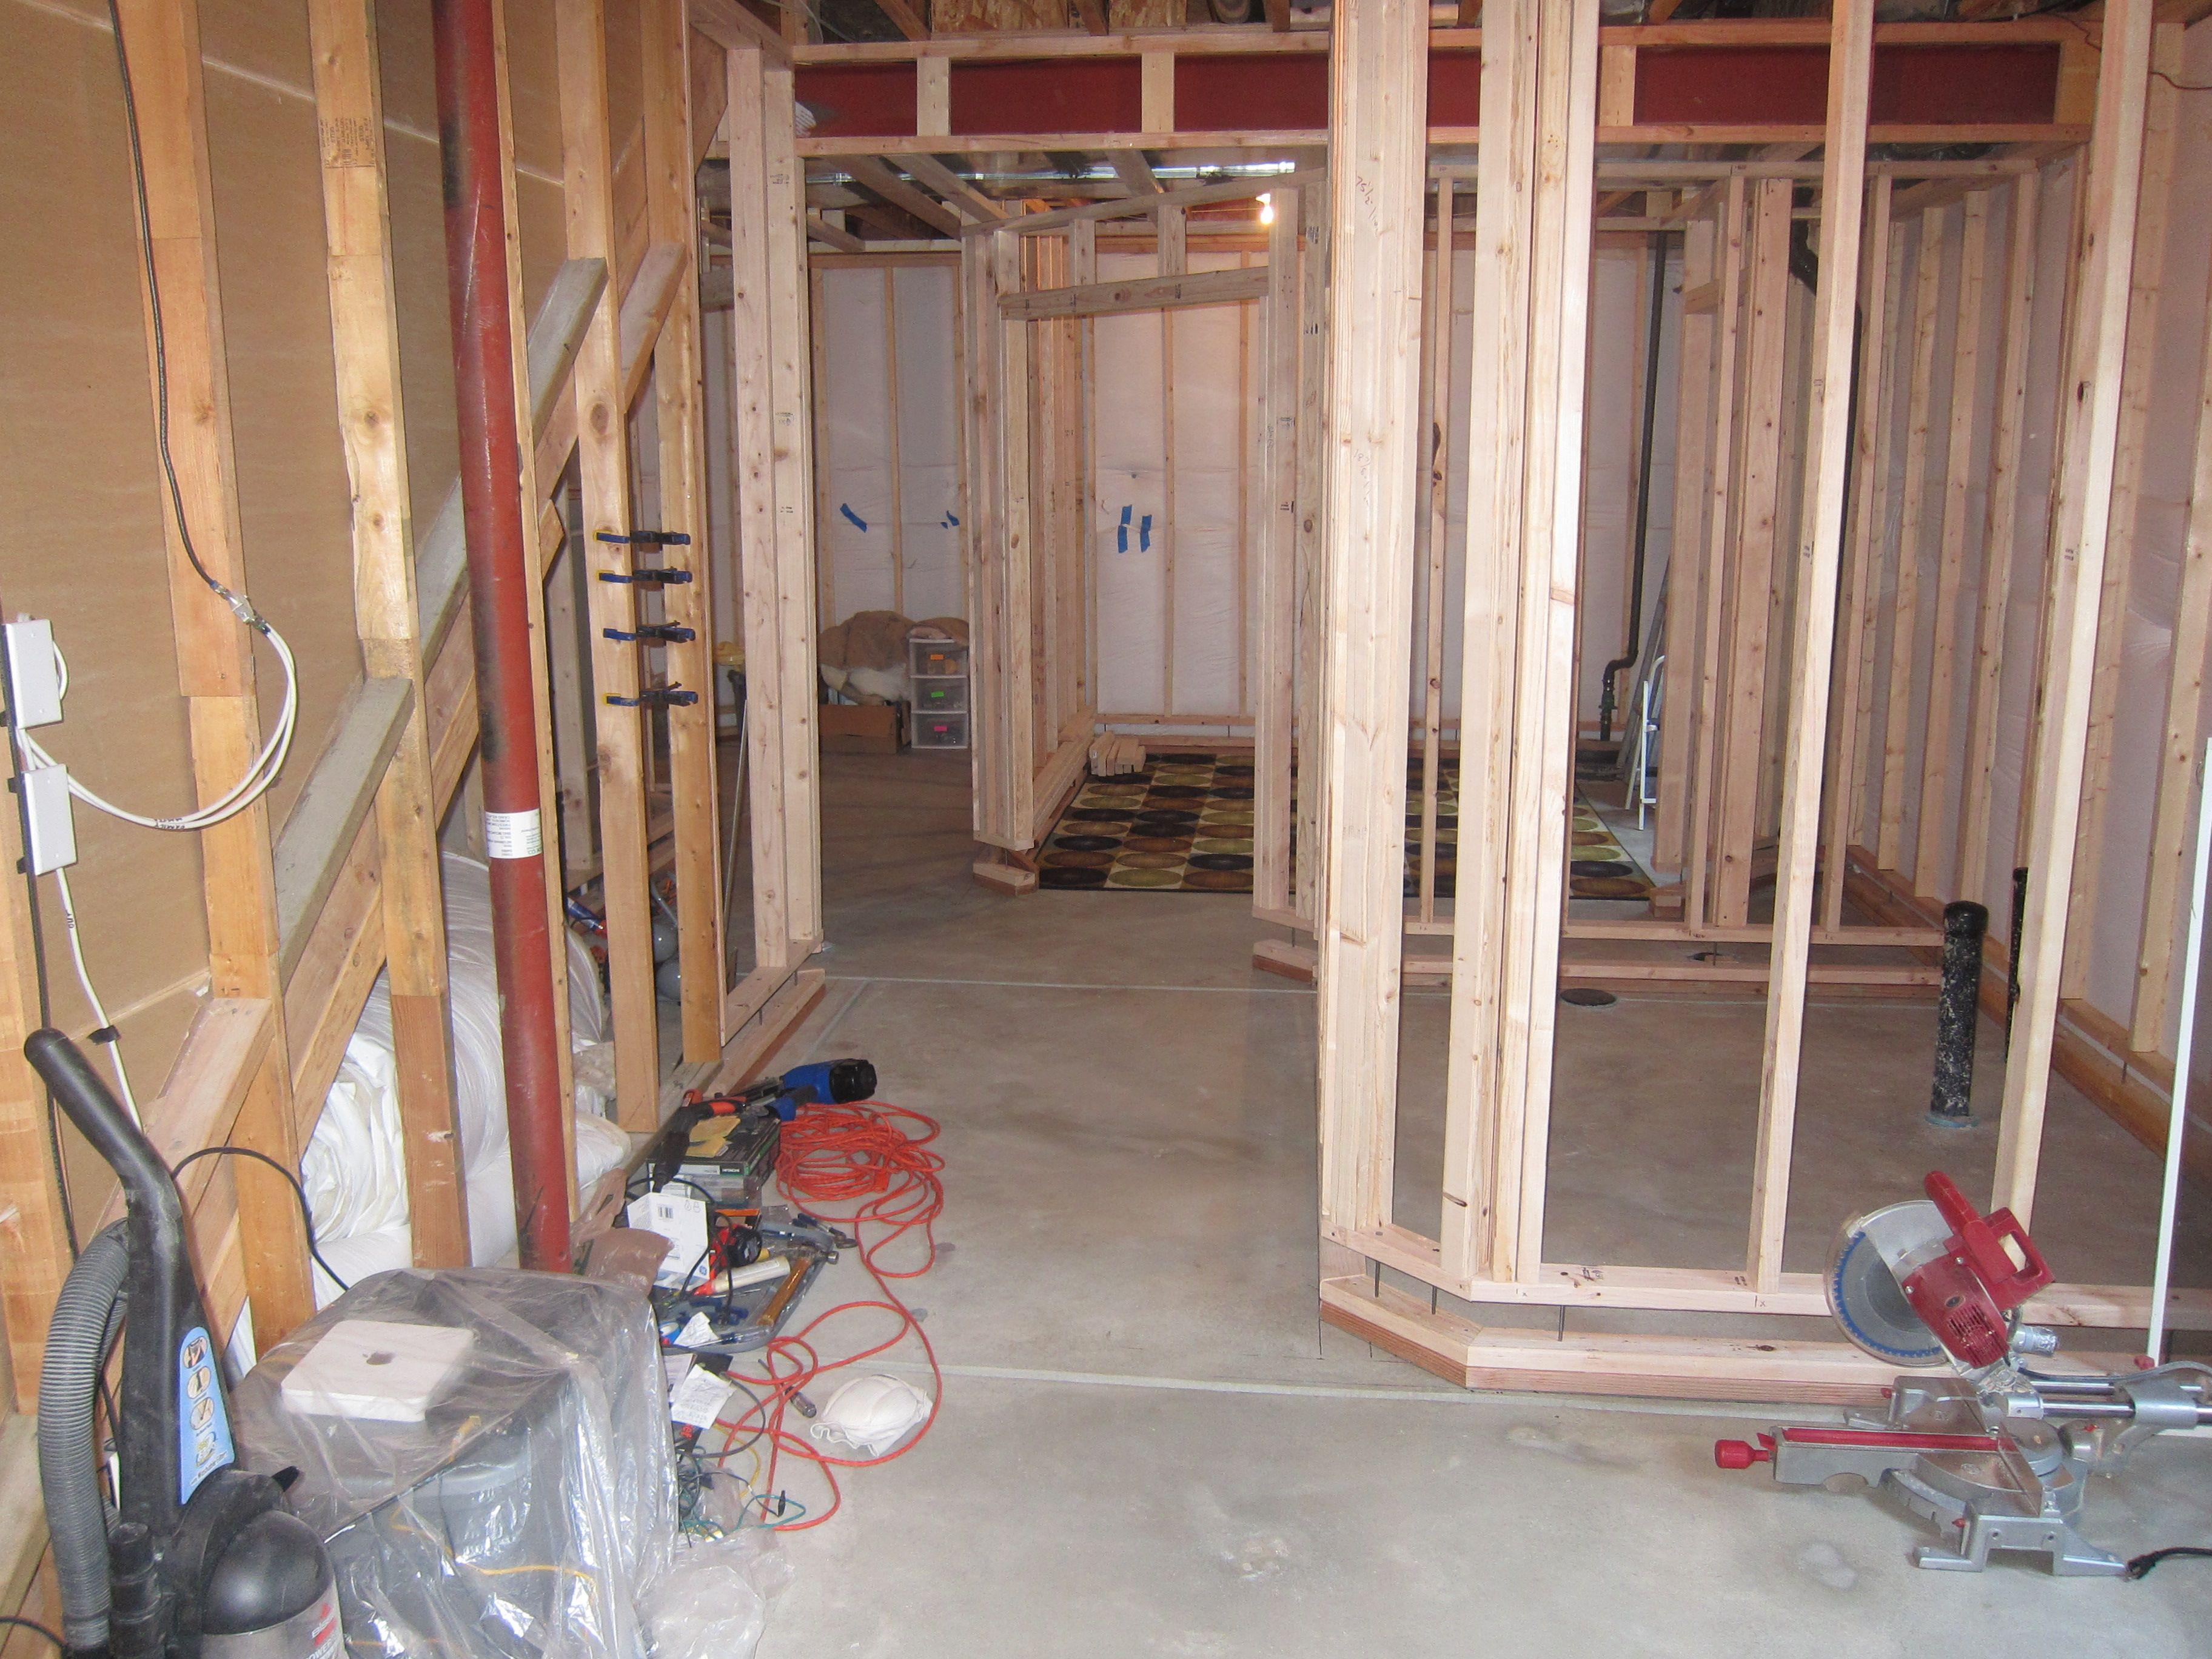 Basement Hallway Framing Stage Basement Walls Floating Wall Framing Basement Walls